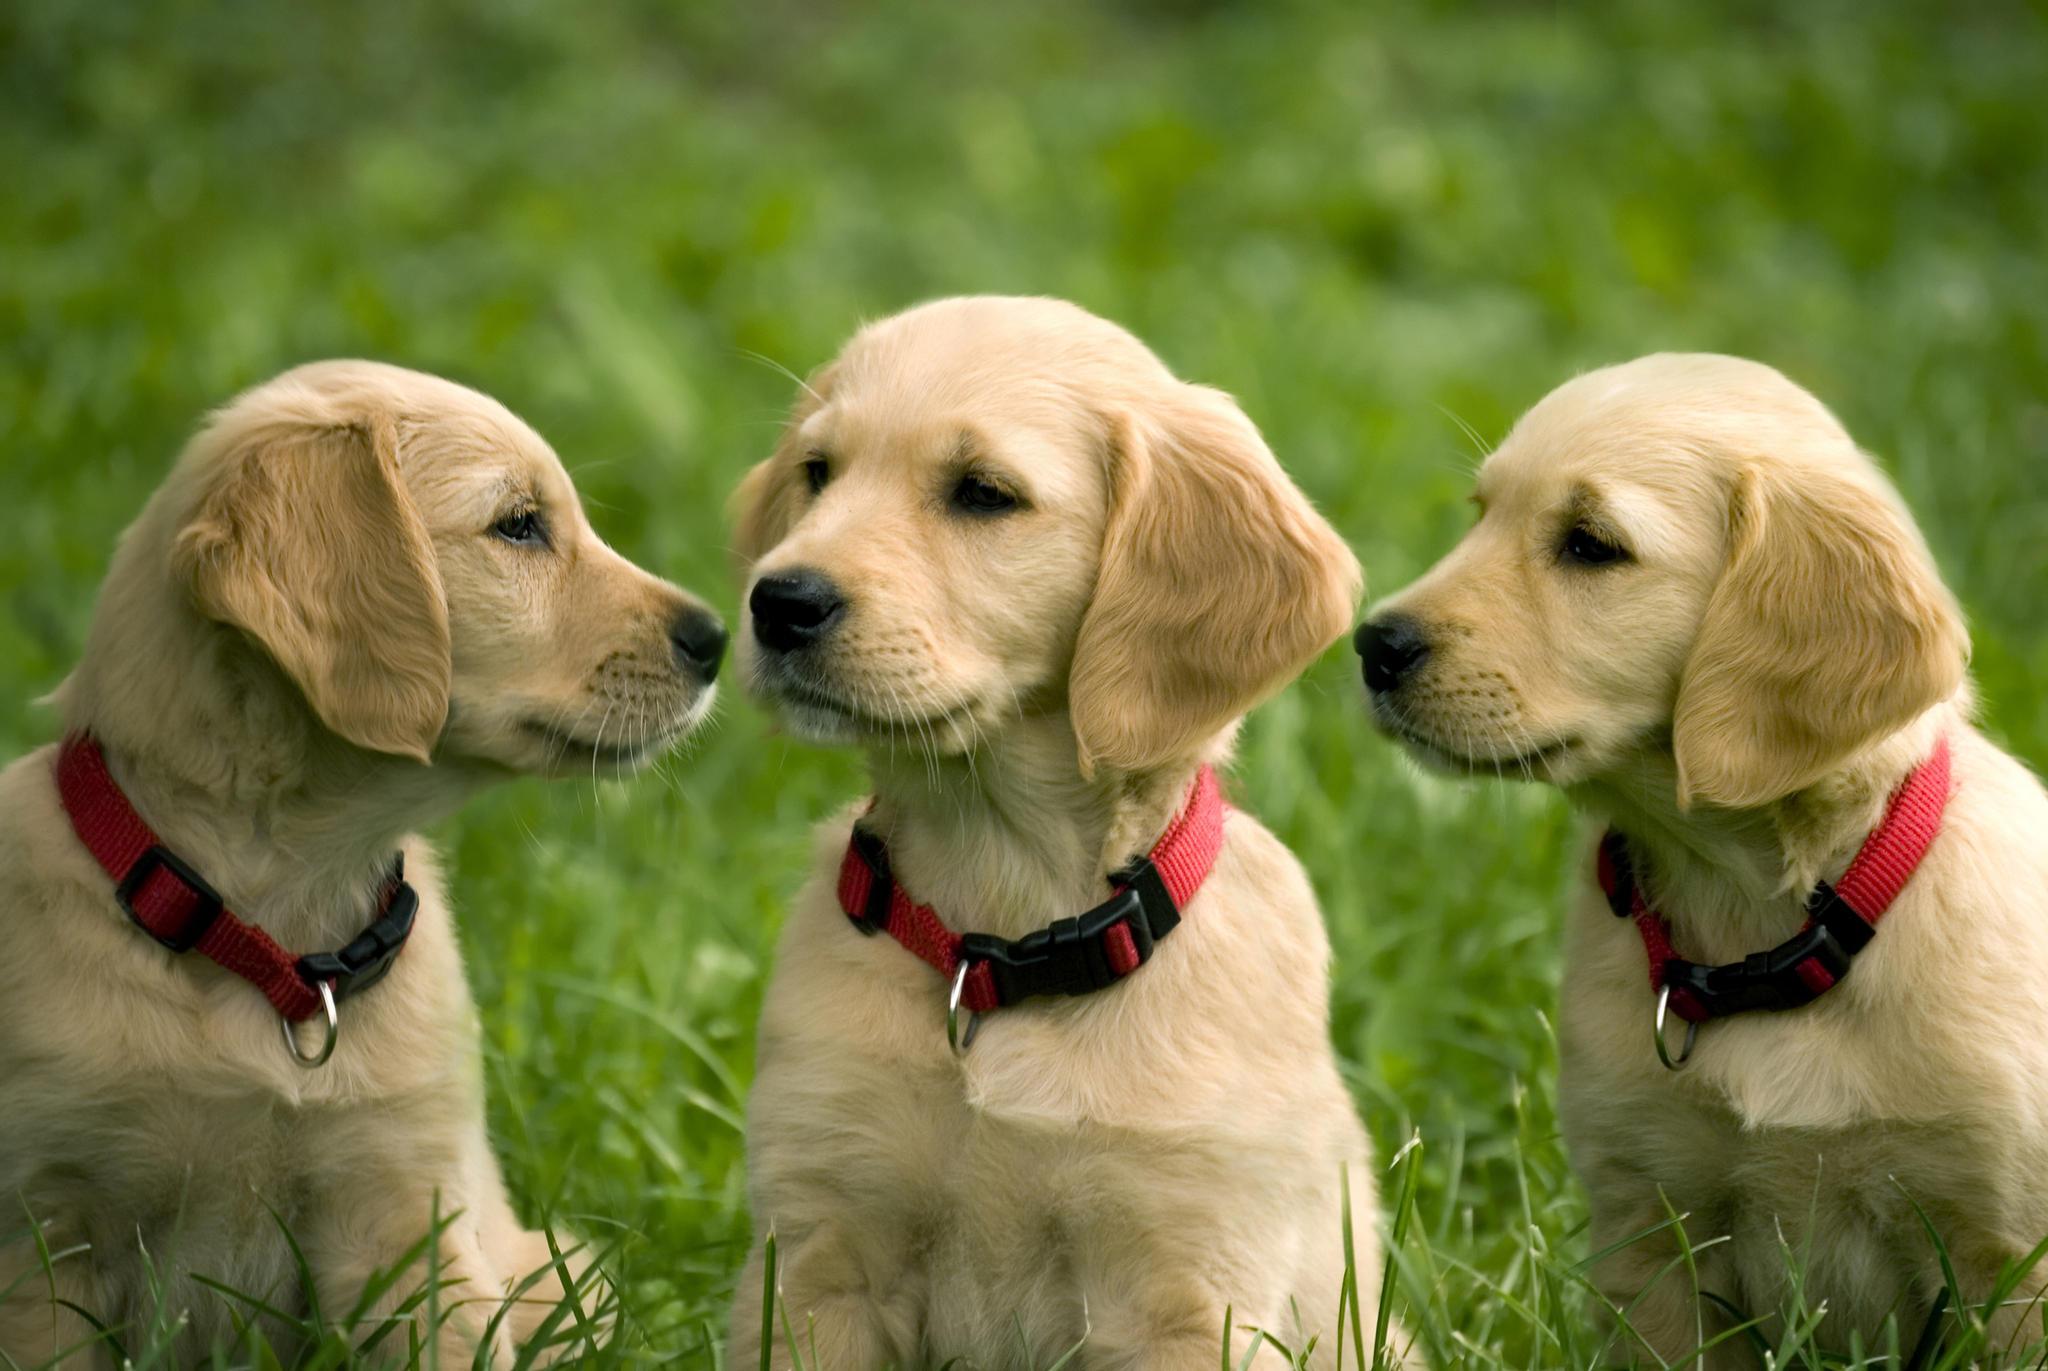 Chien-gris Puppies: Chien Gris Puppies Of Golden Retriever Breed